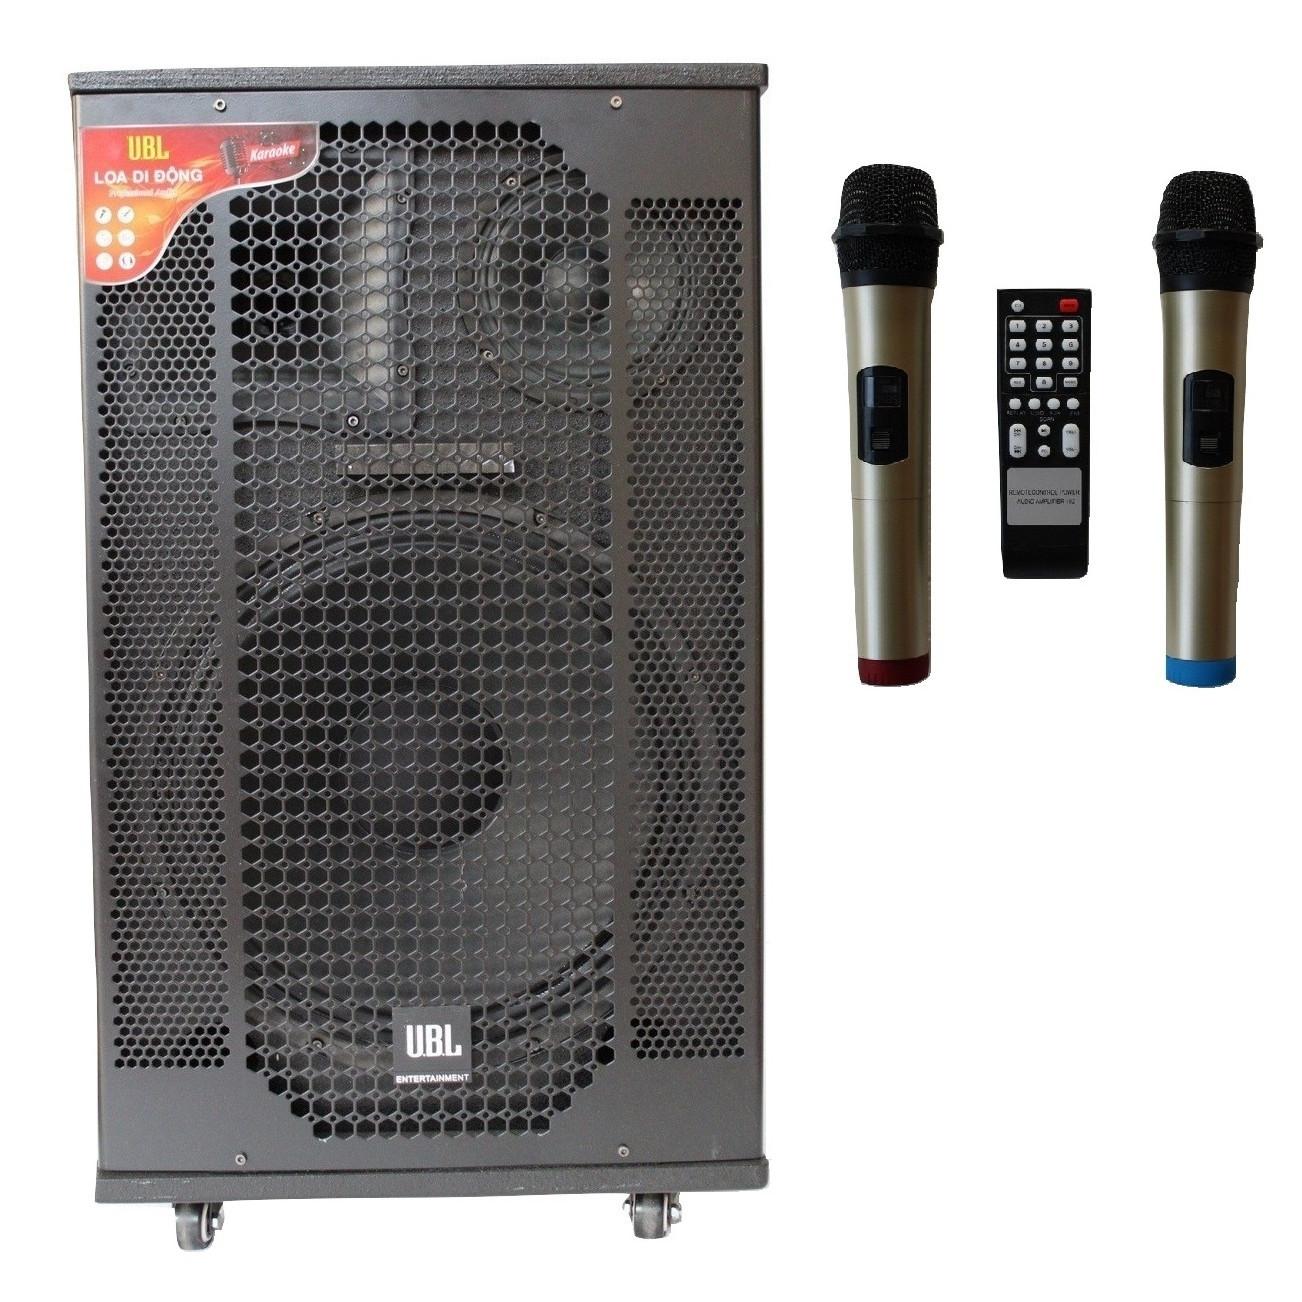 Loa Kéo Di Động Karaoke Bass 40 U.B.L LK-40U60 (800W) 4 Tấc - Chính Hãng